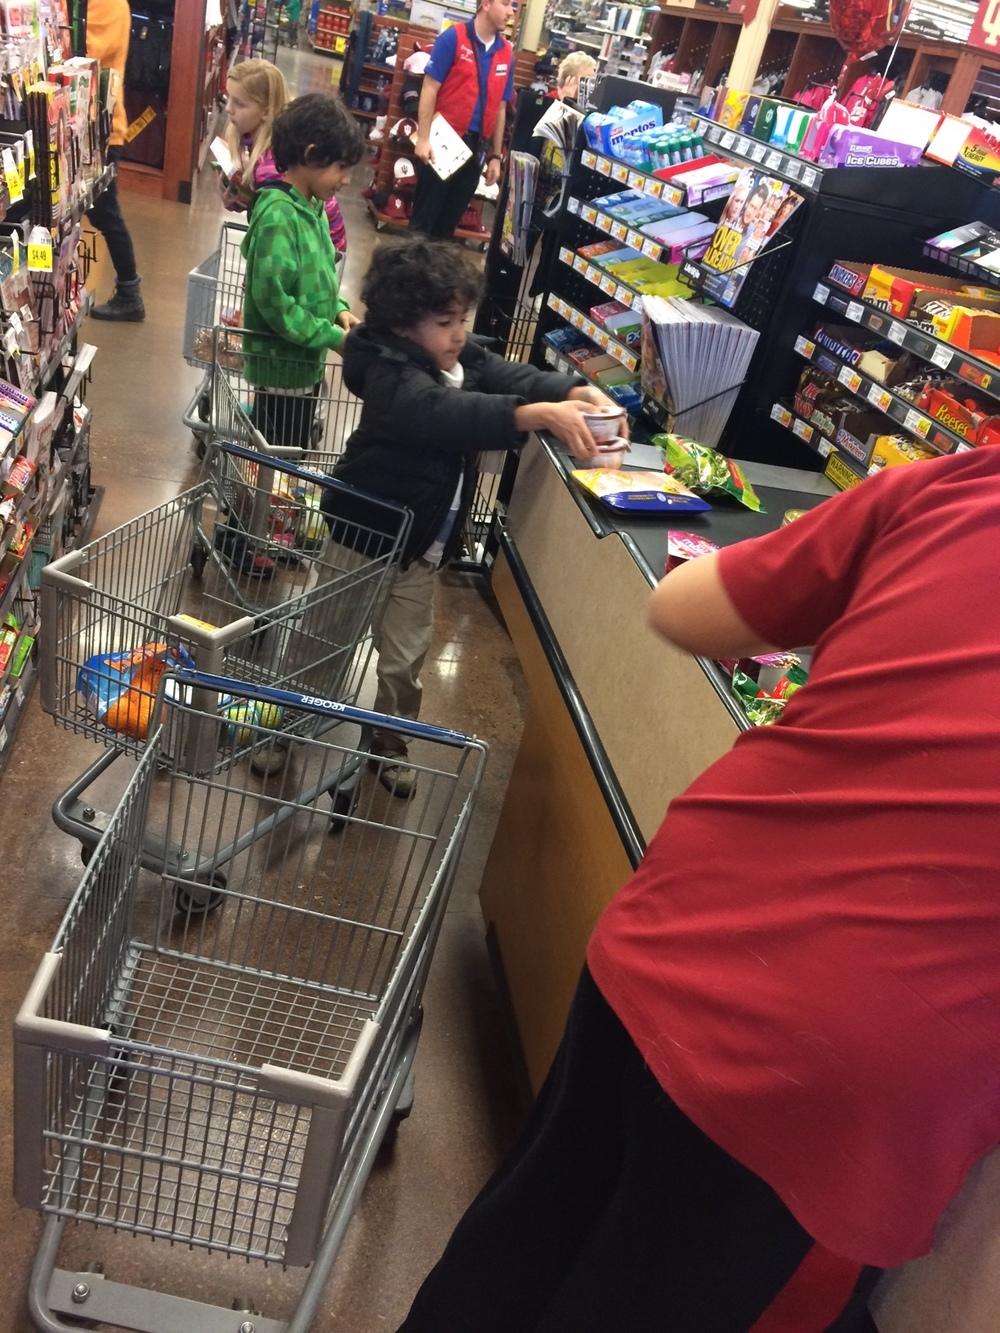 Teamwork at checkout